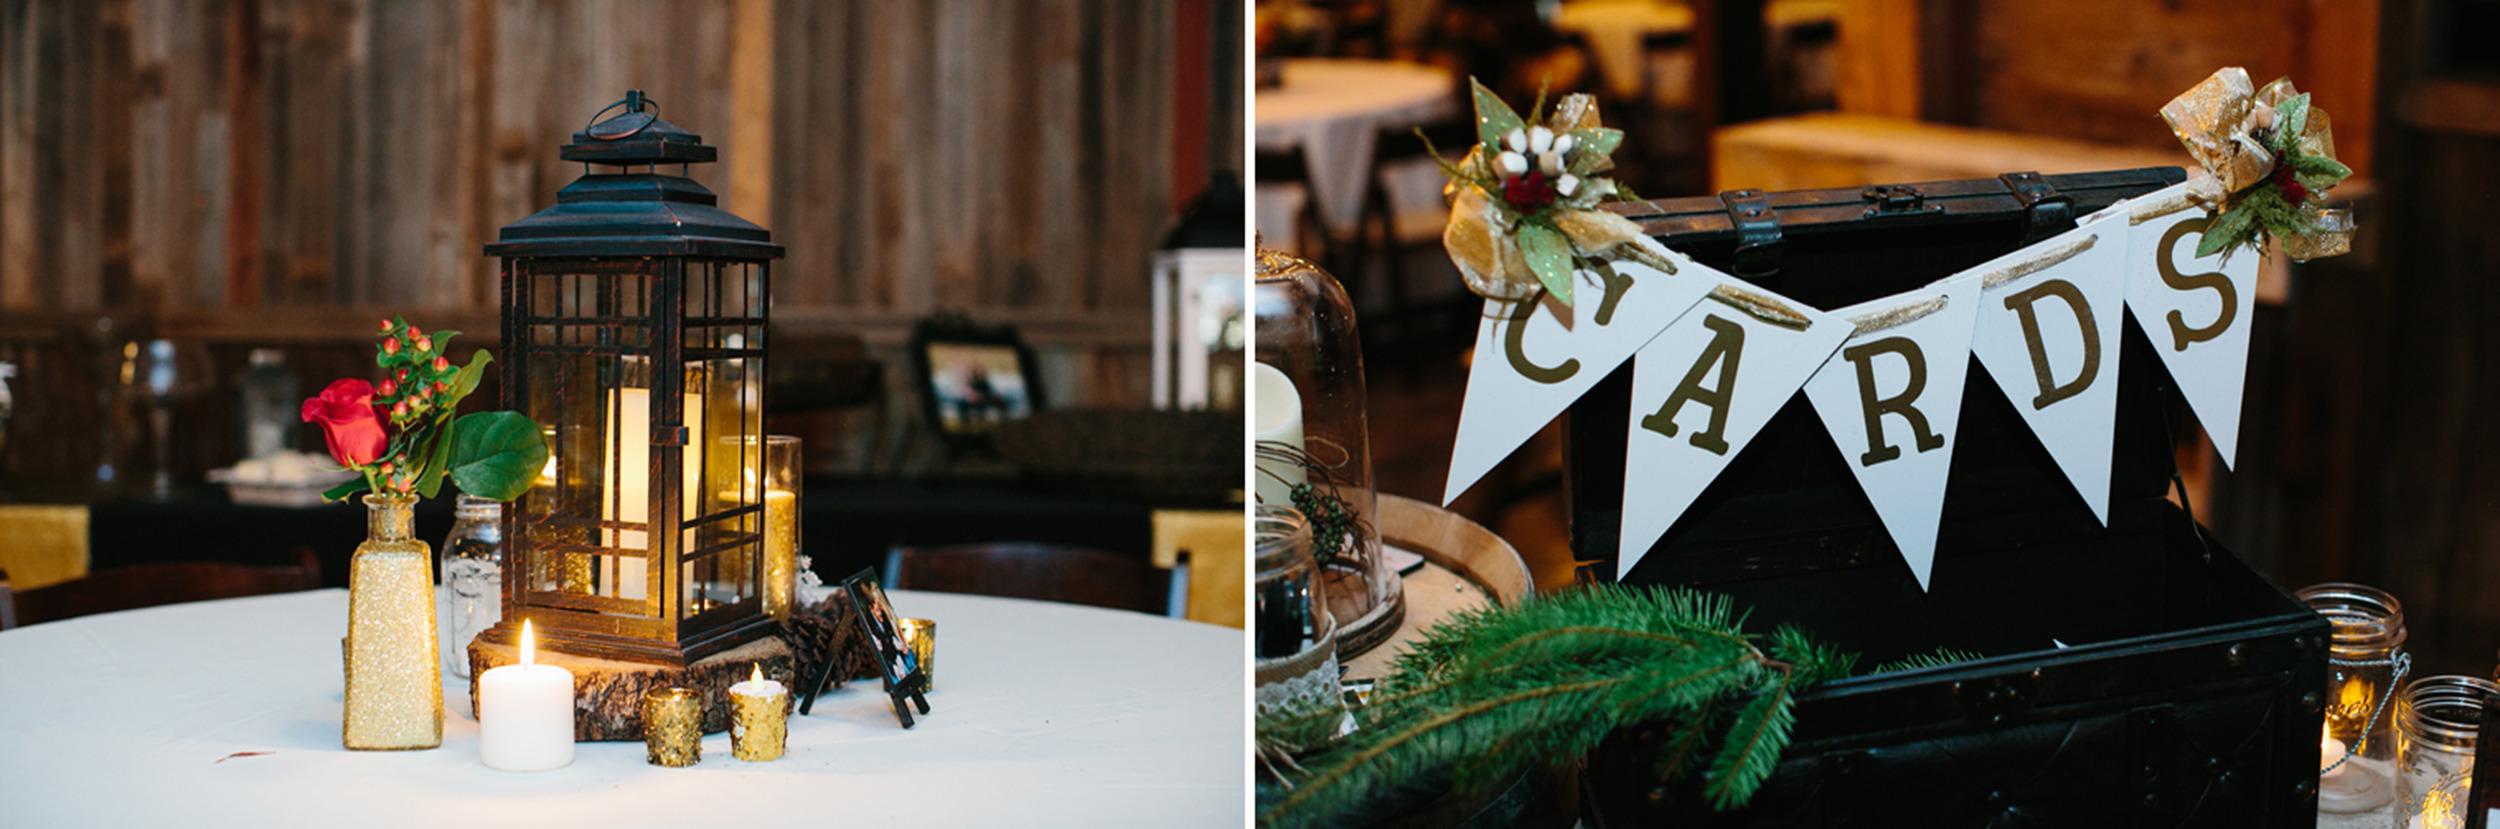 Cotton_Creek_Barn_Winter_Wedding_WeddingPhotographer050.jpg